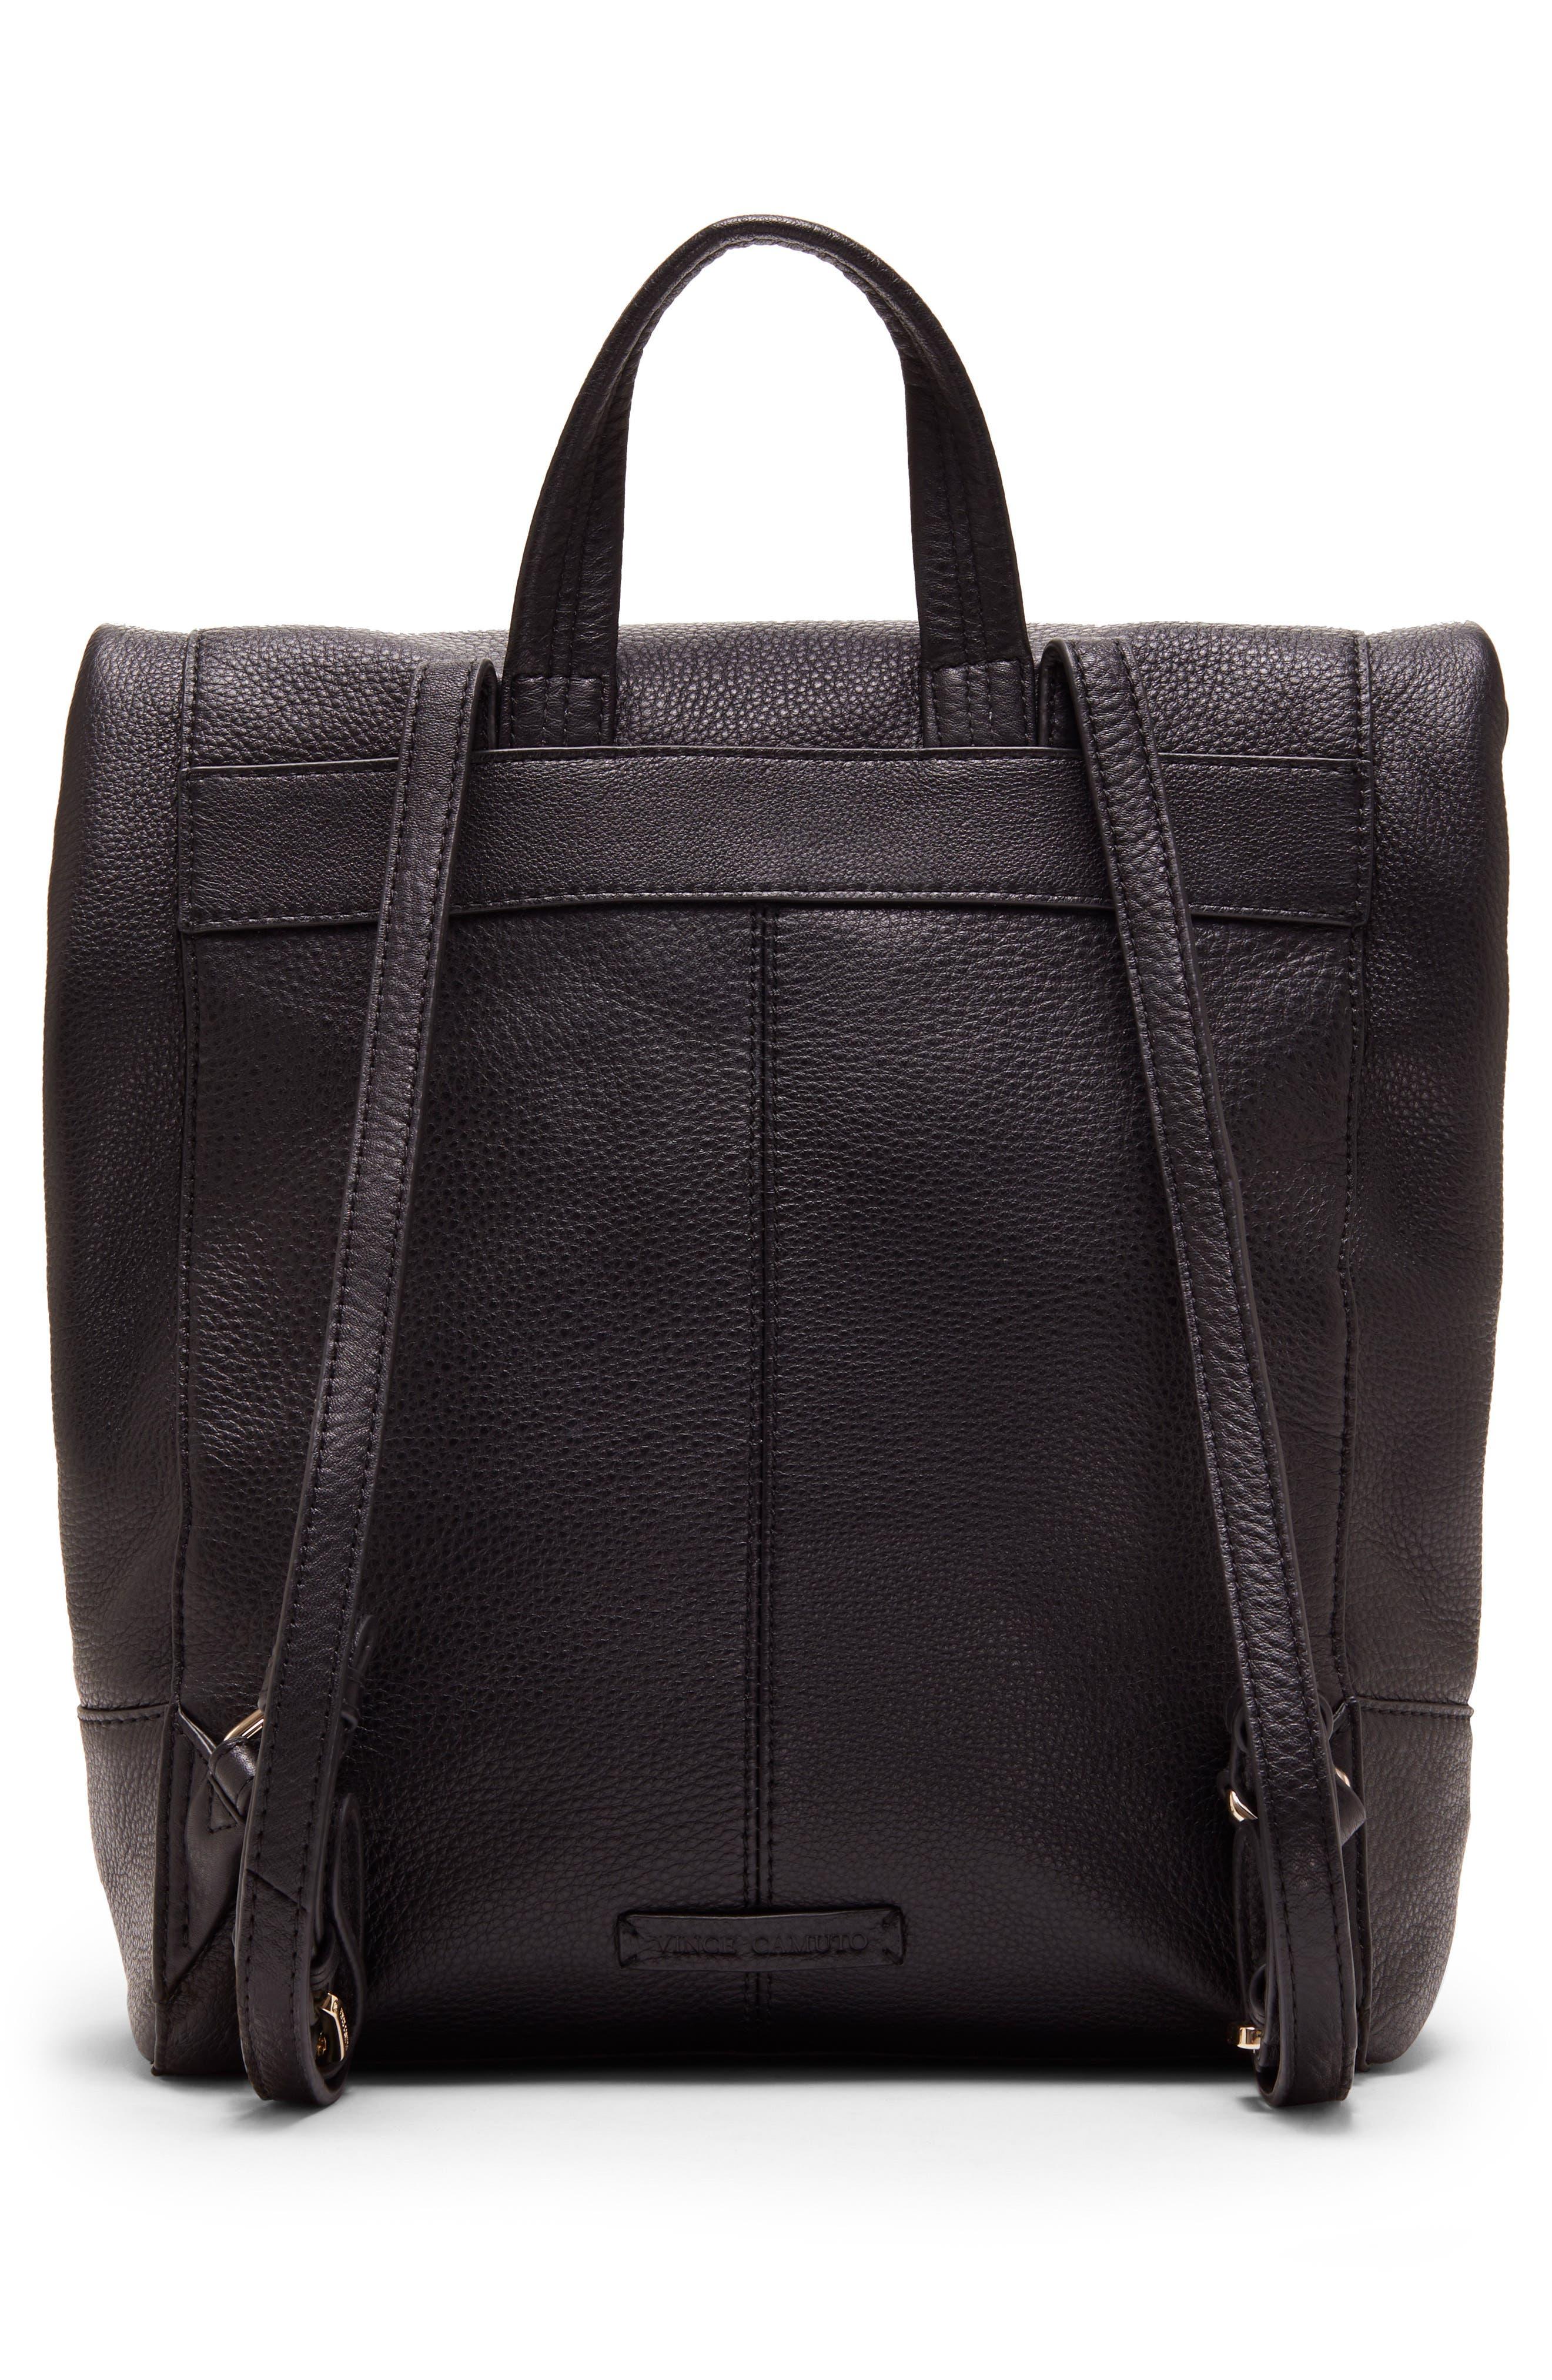 Min Pebbled Leather Backpack,                             Alternate thumbnail 2, color,                             BLACK